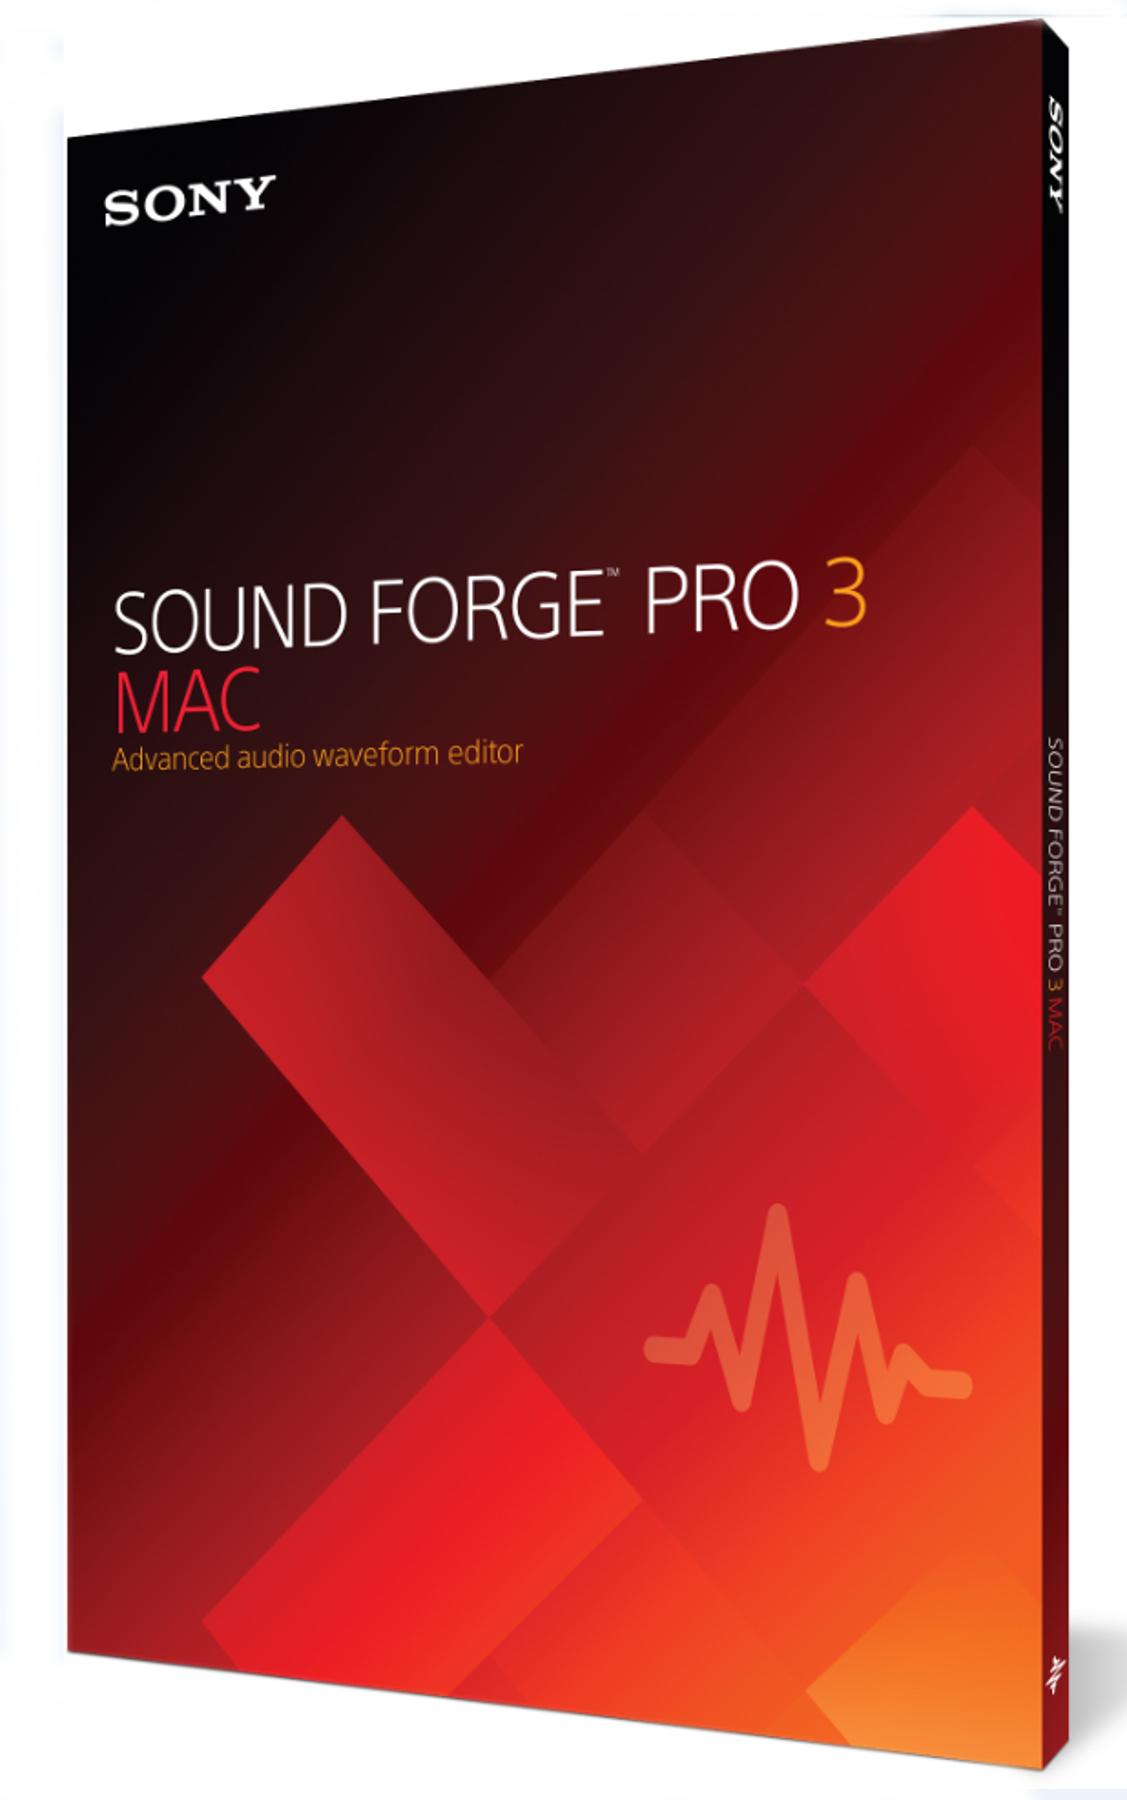 Advanced Audio Waveform Editor, Mac